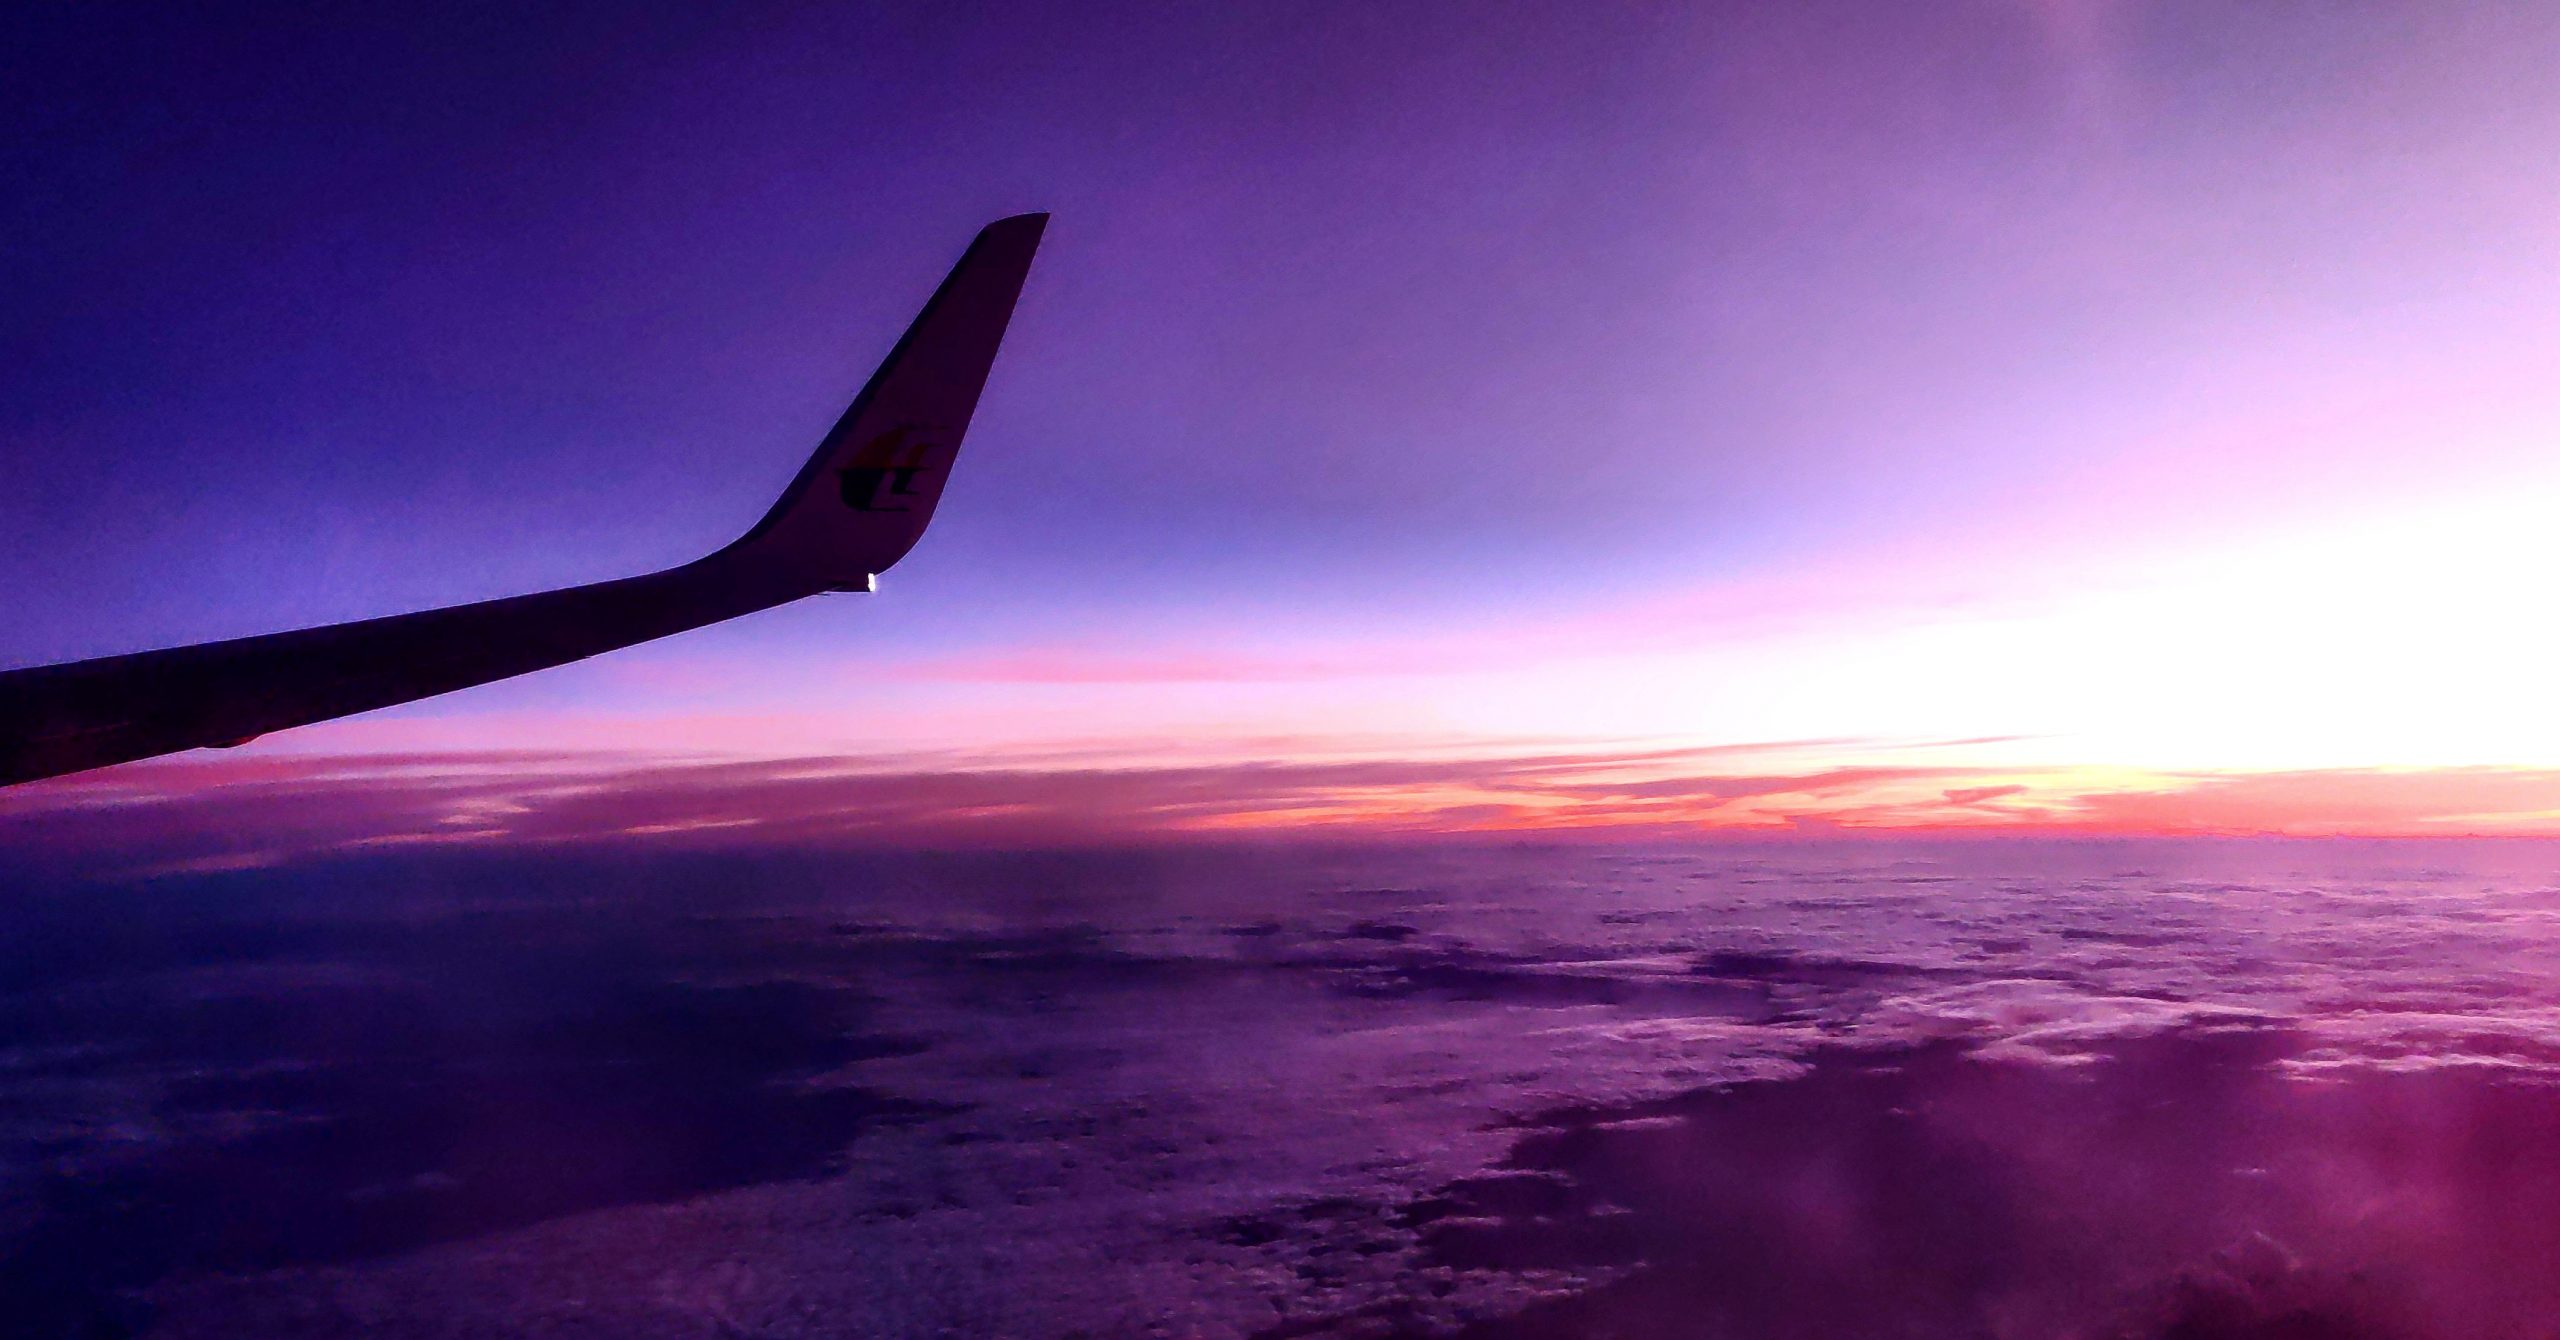 Airplane wingtip